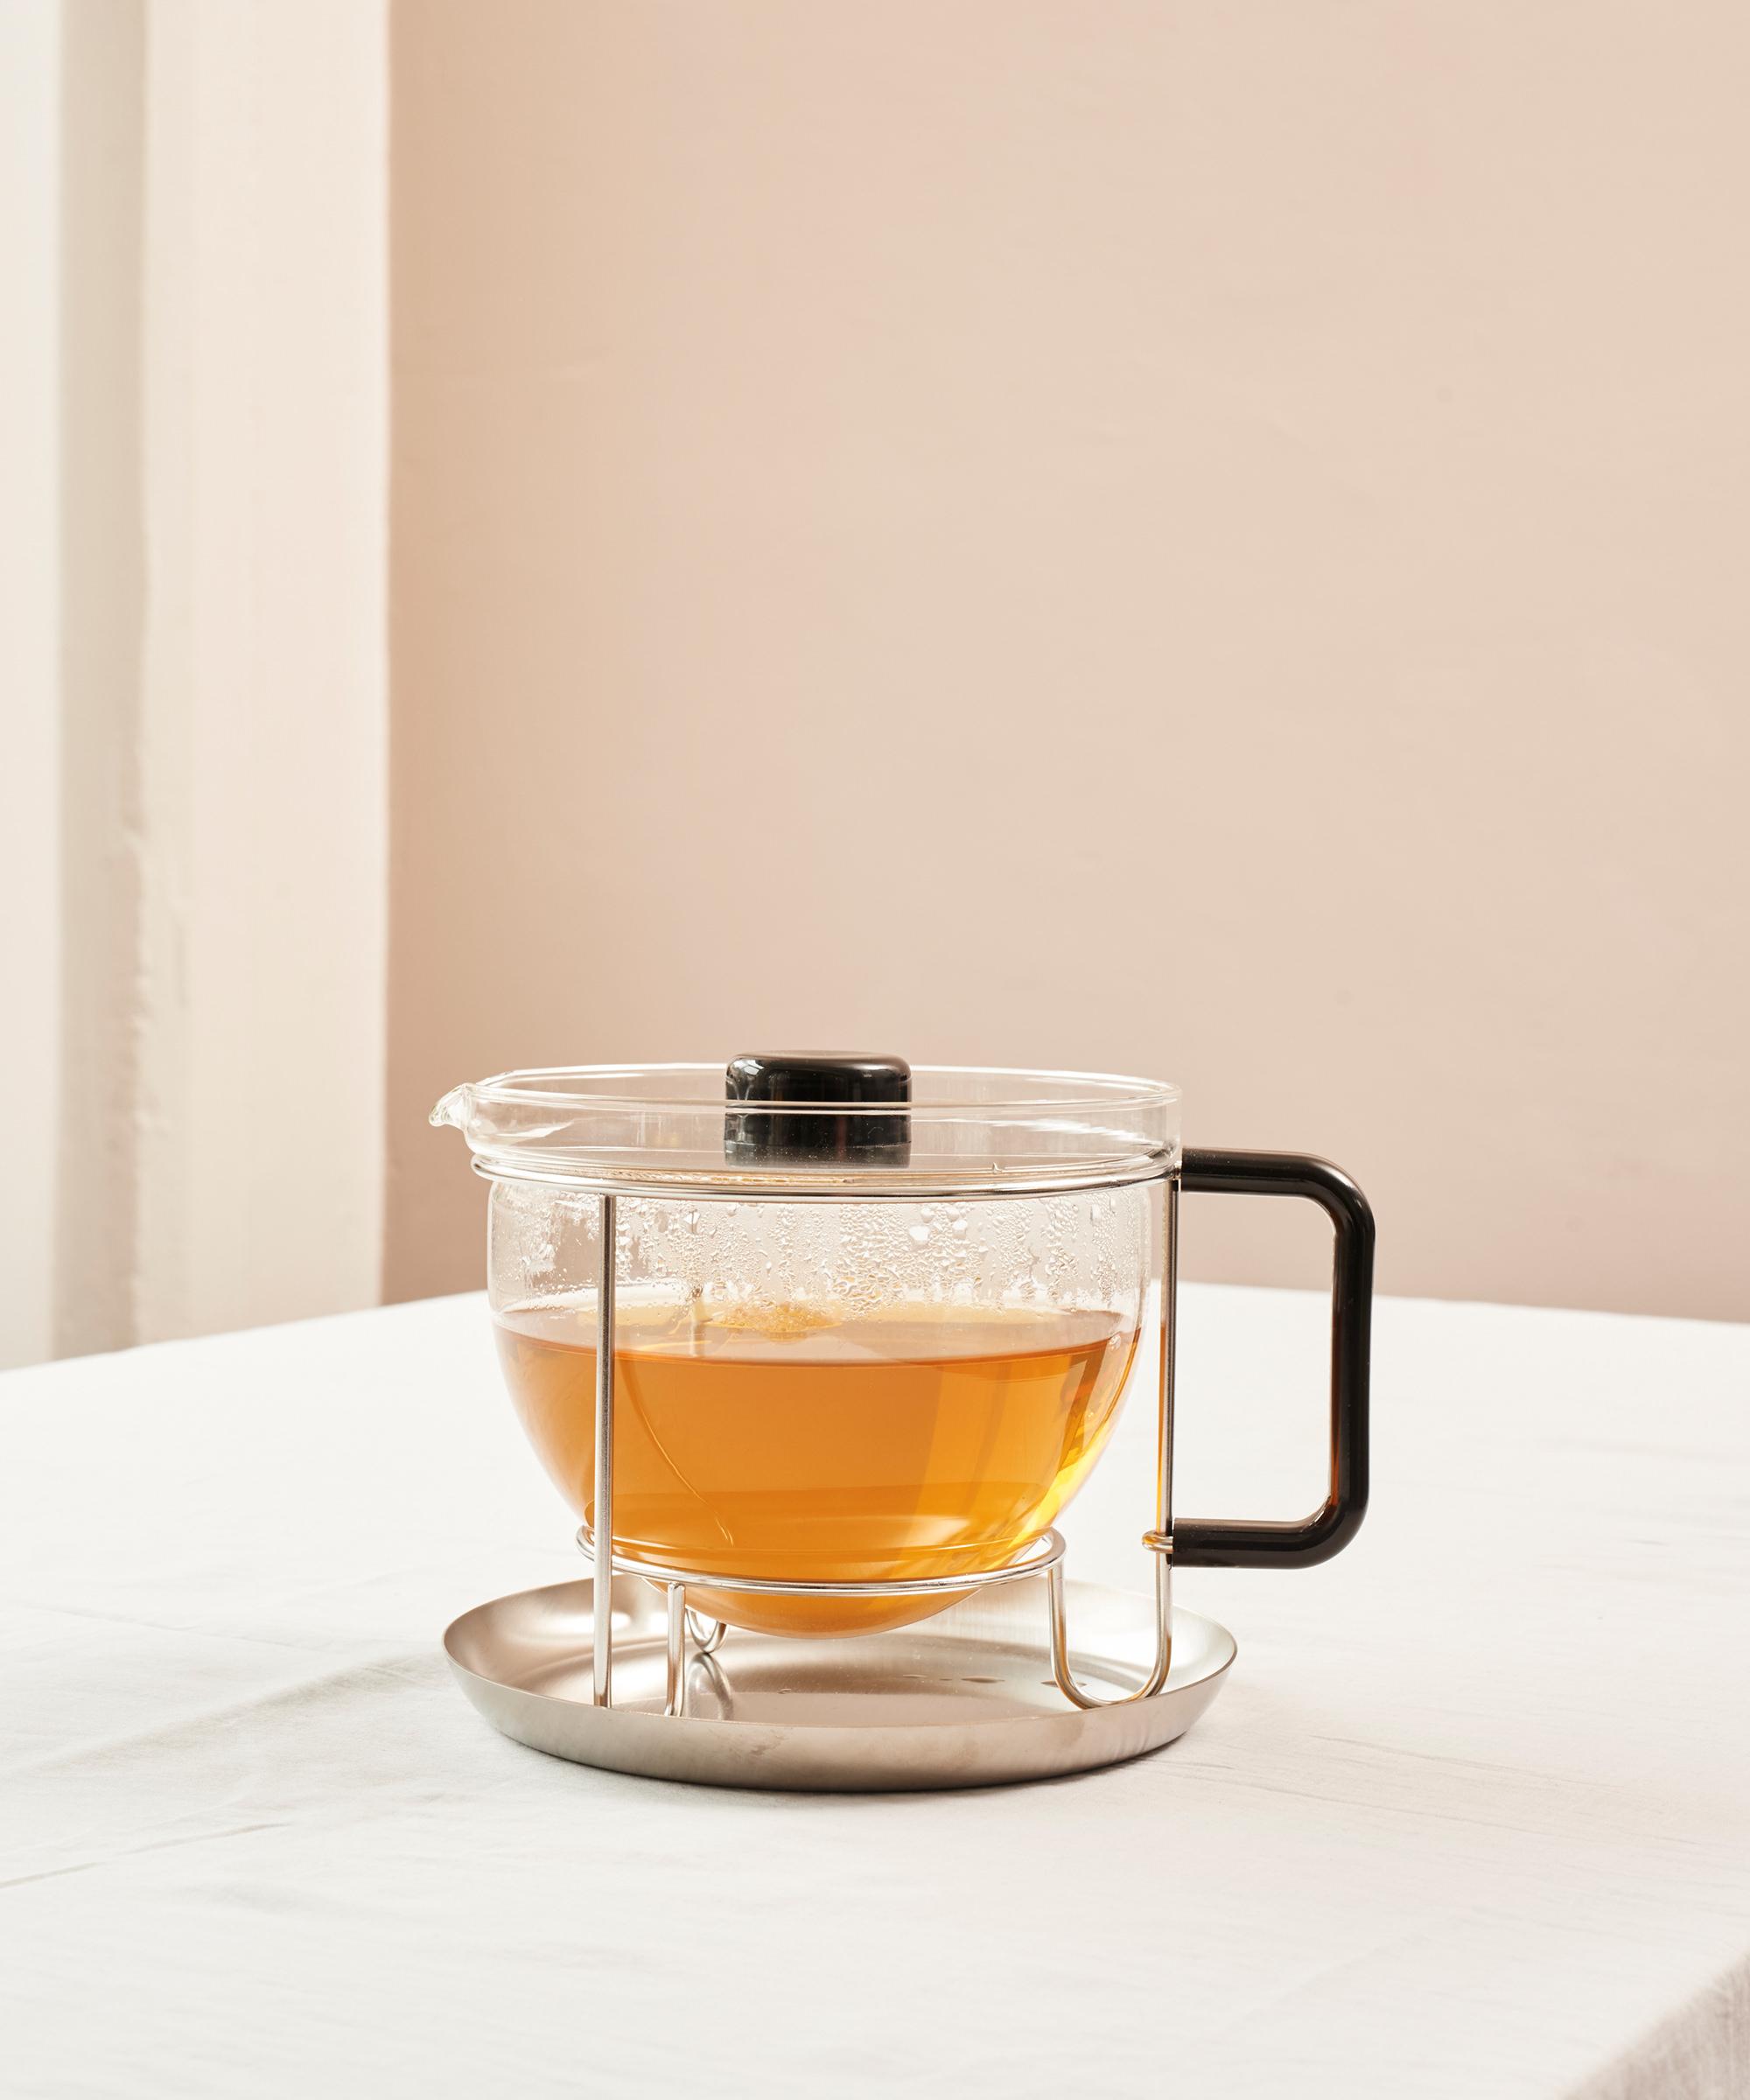 10450 Mono Classic Teekanne Teapot 02